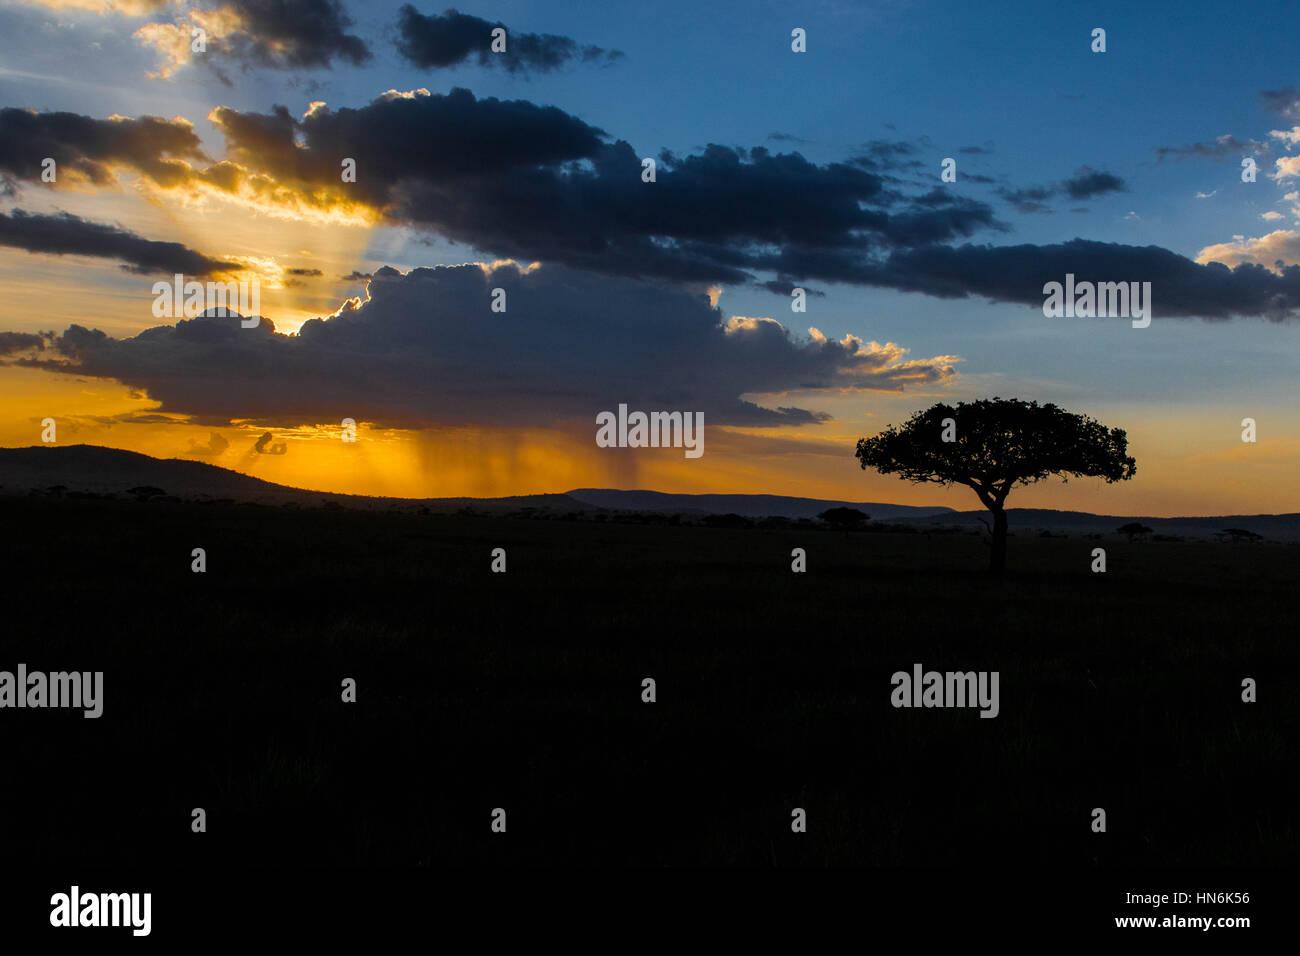 SERENGETI Silueta de árbol con atardecer africano en el Parque nacional Serengeti, Tanzania, África Imagen De Stock